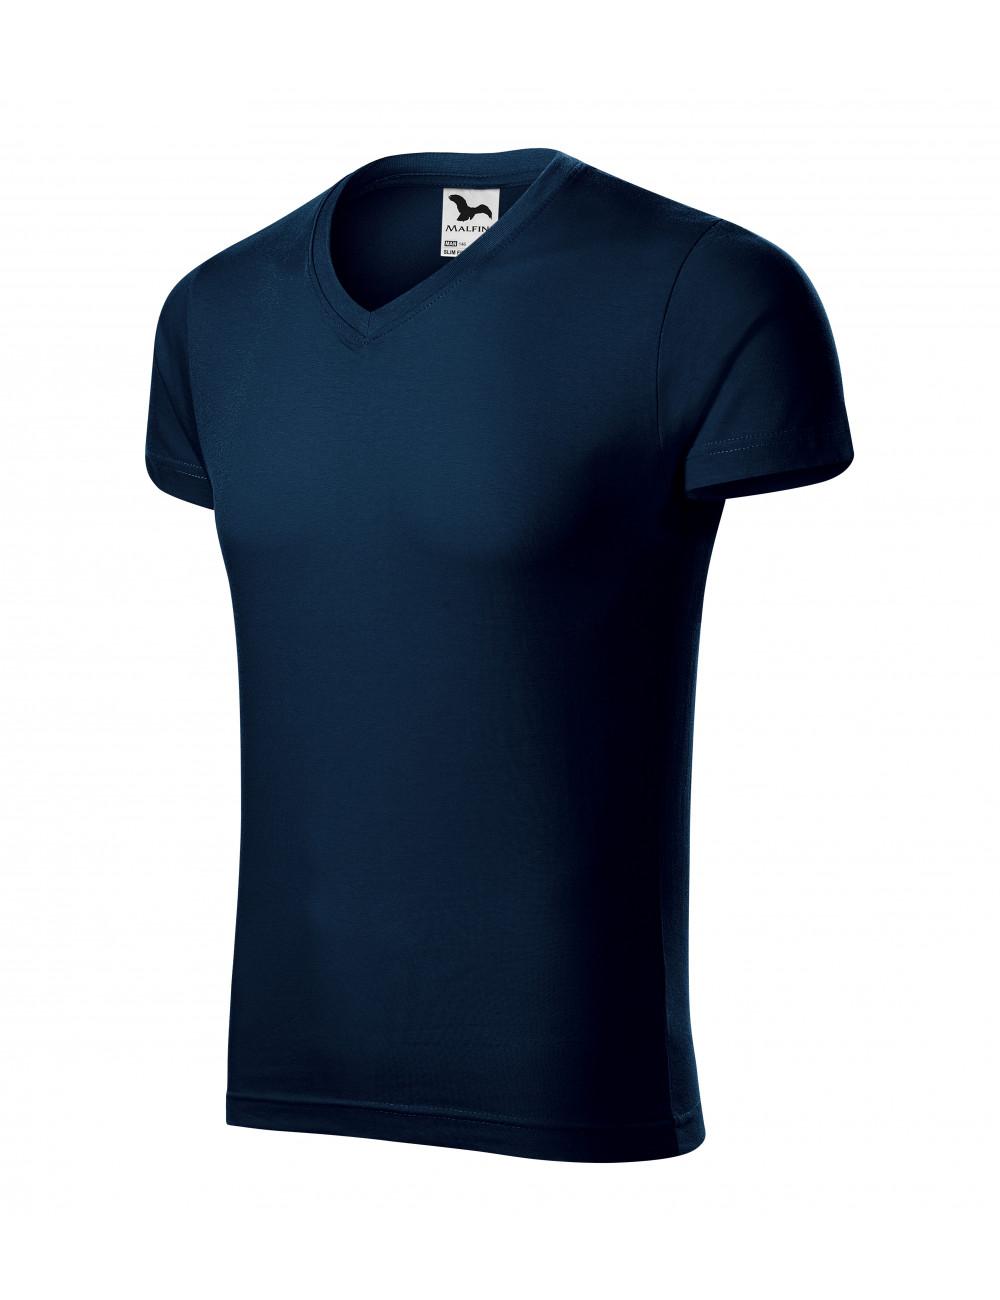 Adler MALFINI Koszulka męska Slim Fit V-neck 146 granatowy